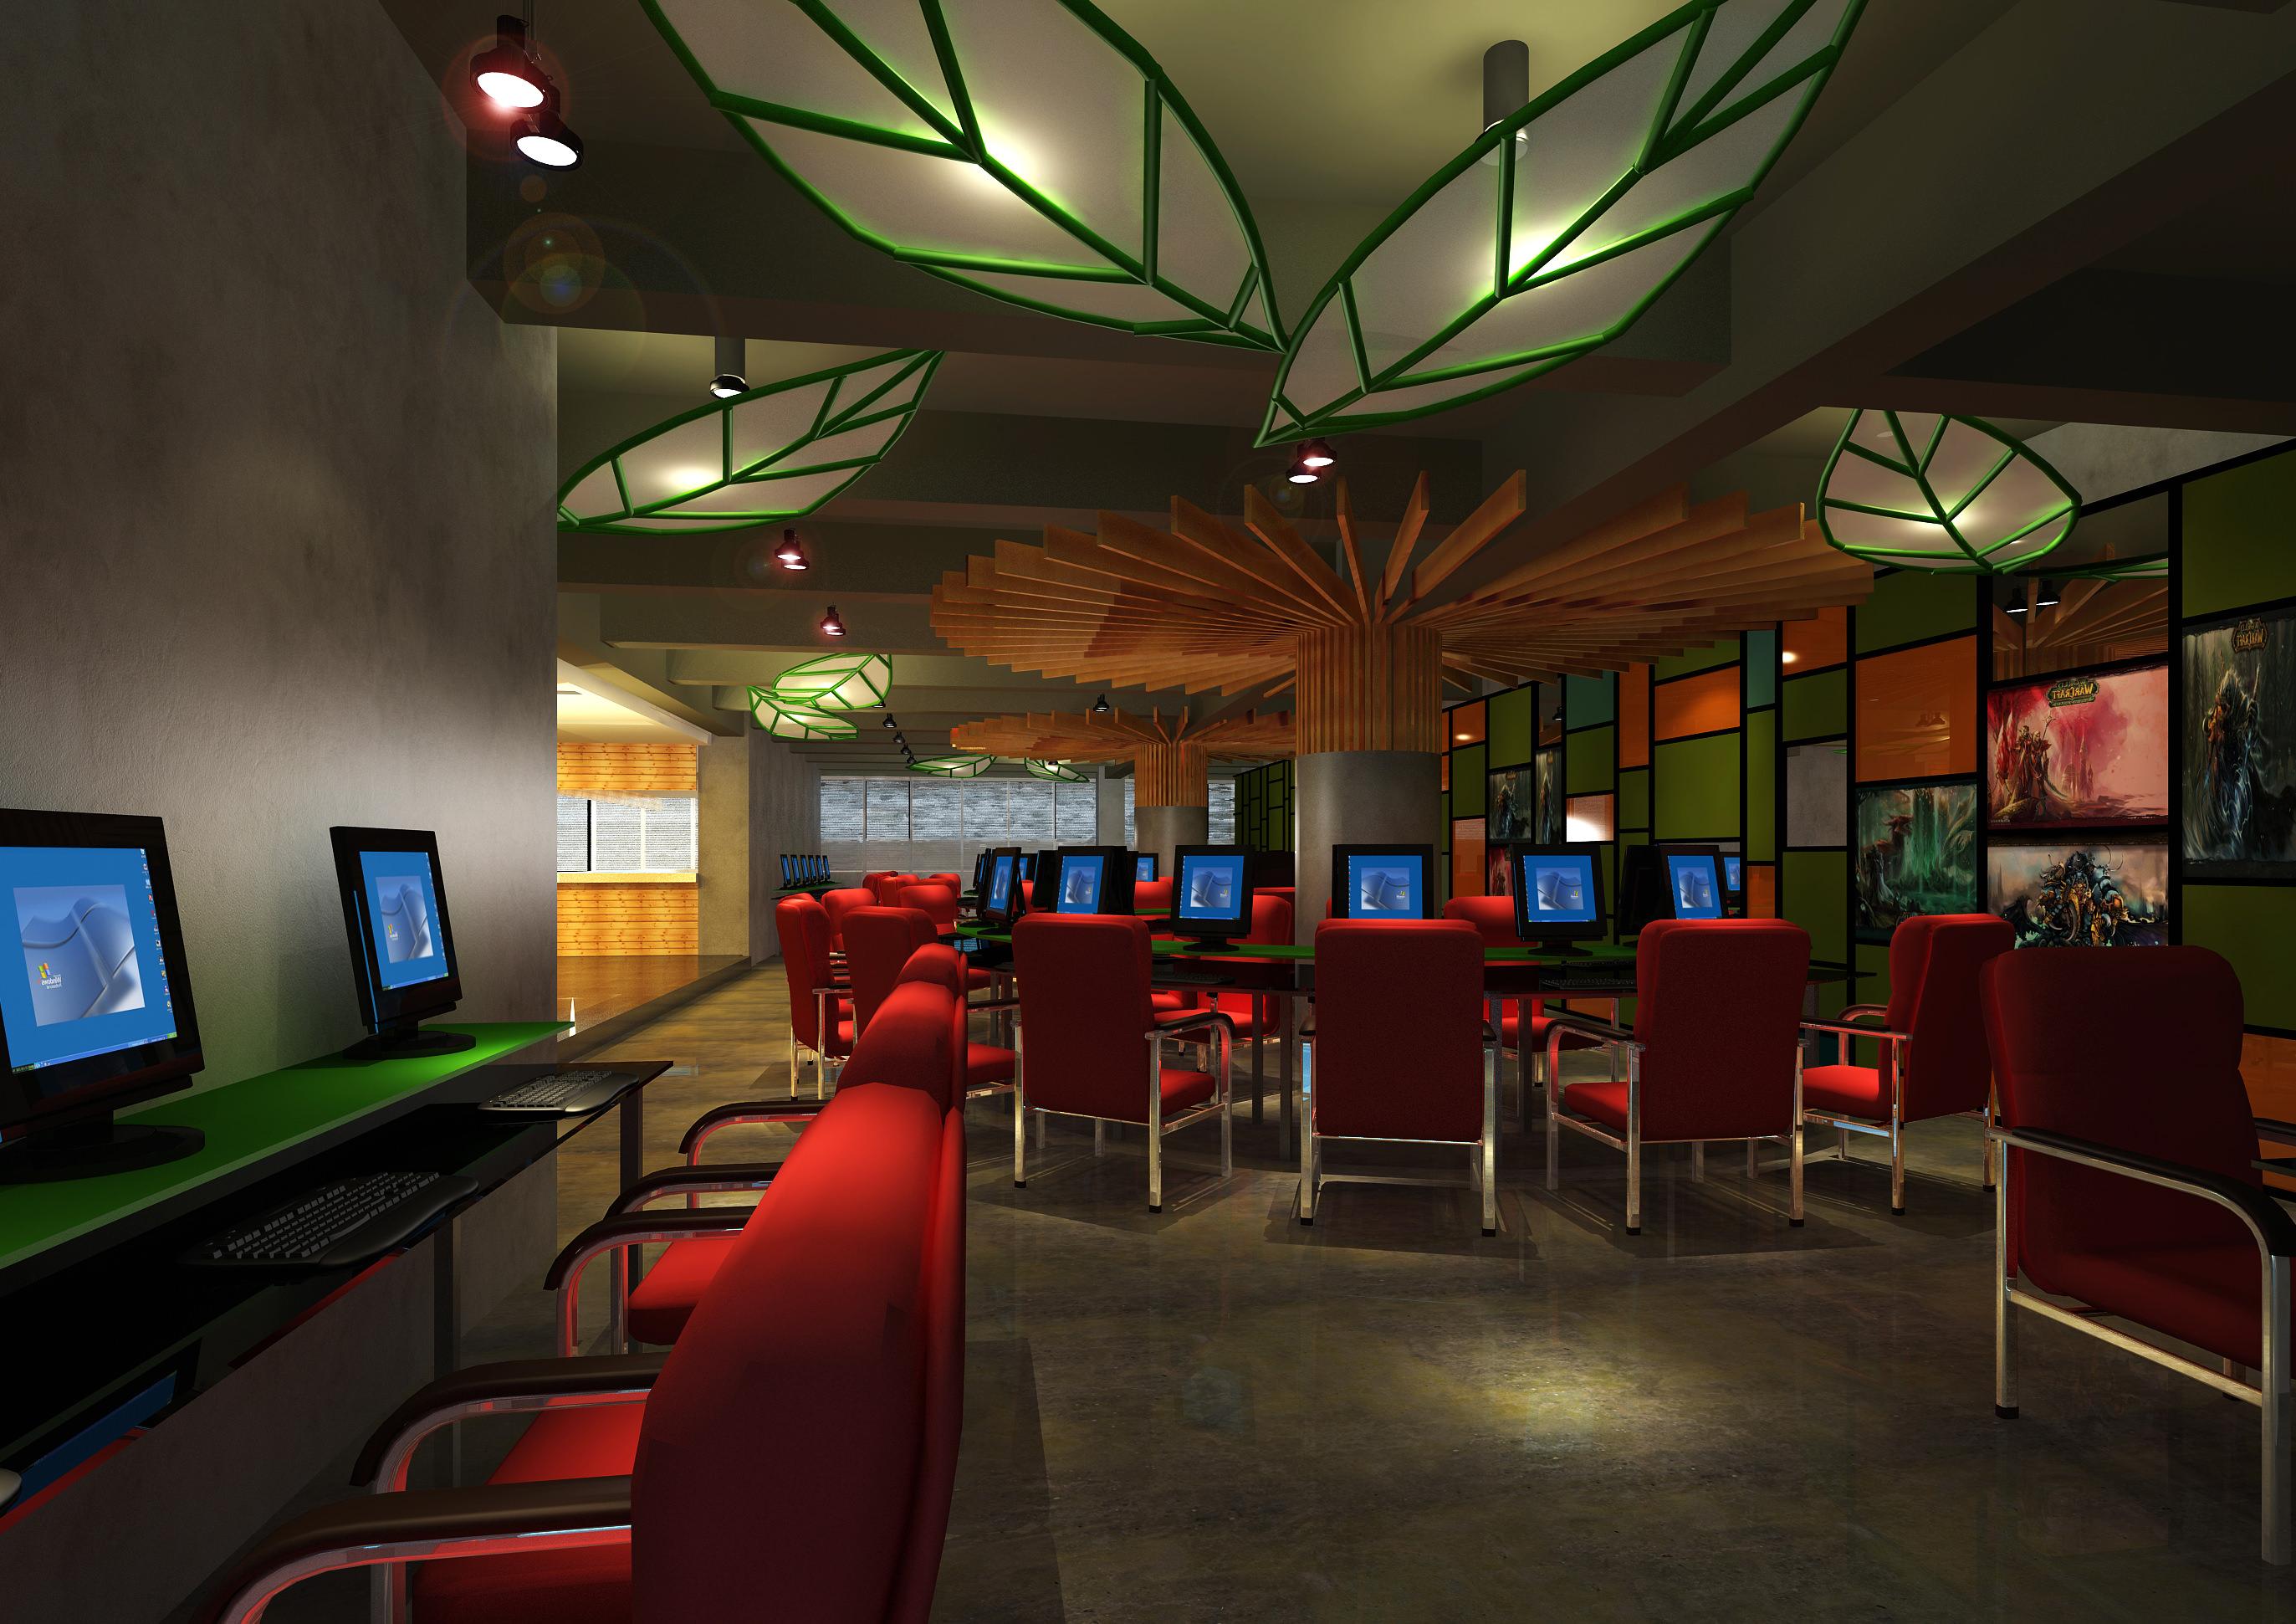 Cafe Interior Design Images Hd Brucall Com Best Decoration Interieur Cafe  Bar Gallery Design Trends With Interieur Cafe